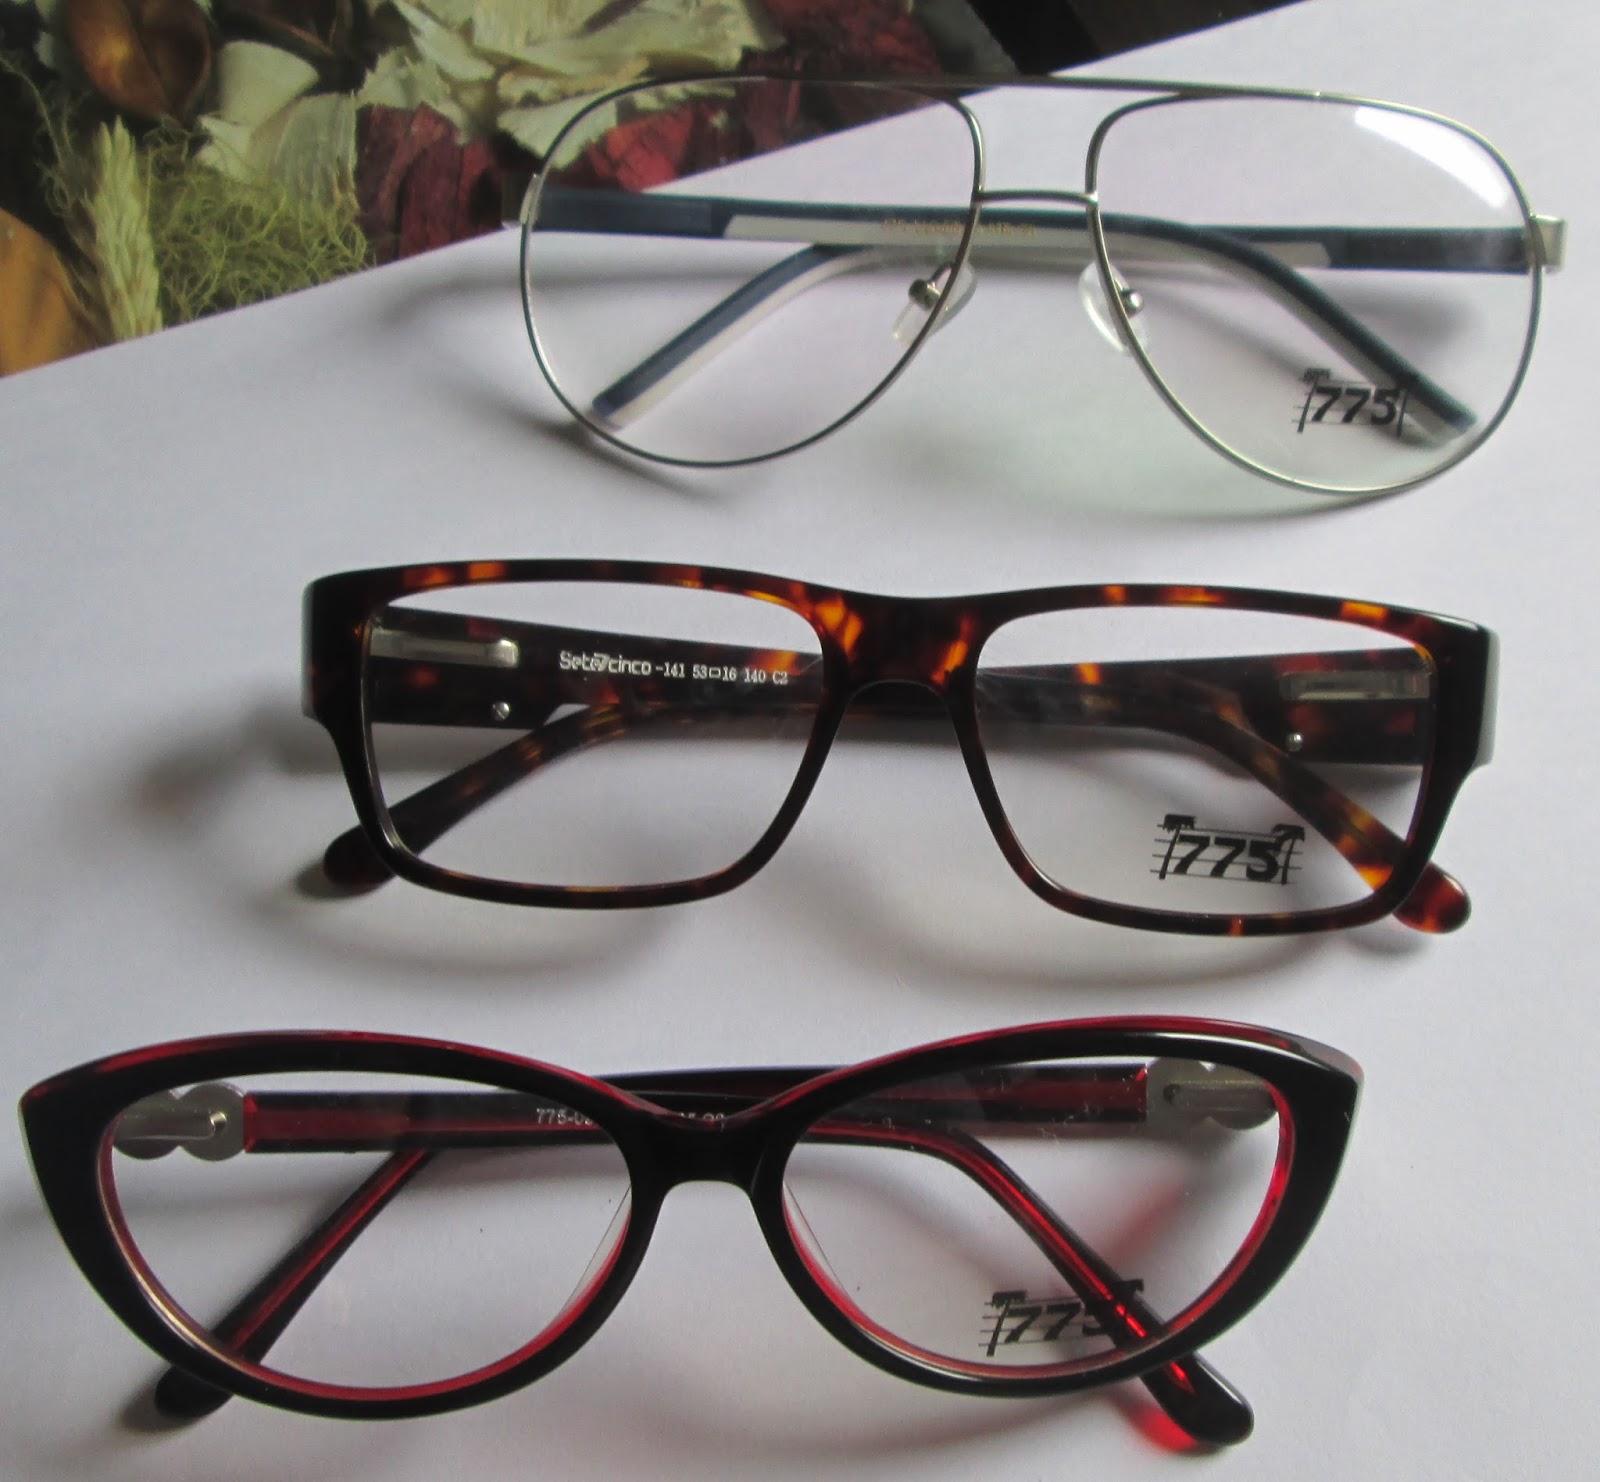 273420de48ece Óculos marca 775 fabricado na S7 Occhiali